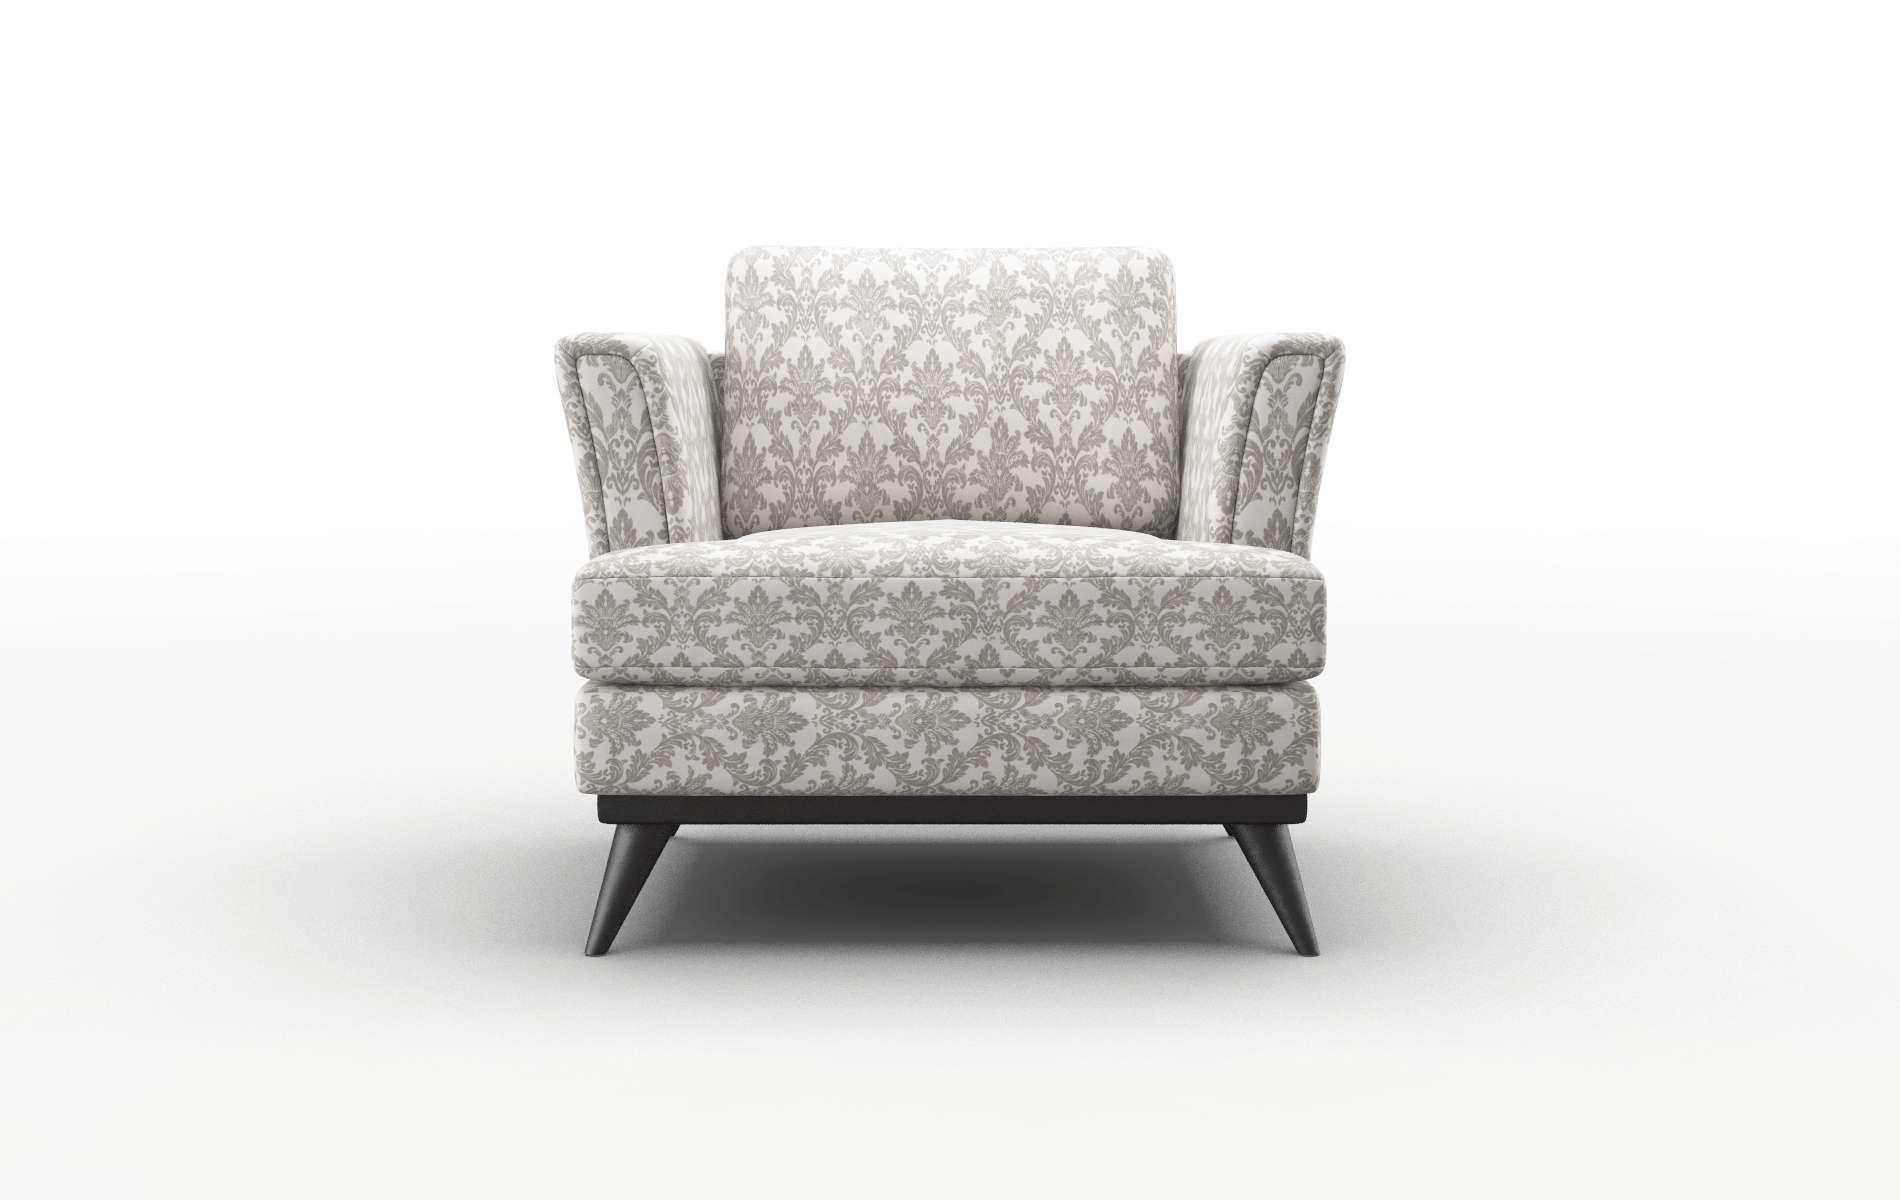 Antalya Bergamo Dove Chair espresso legs 1